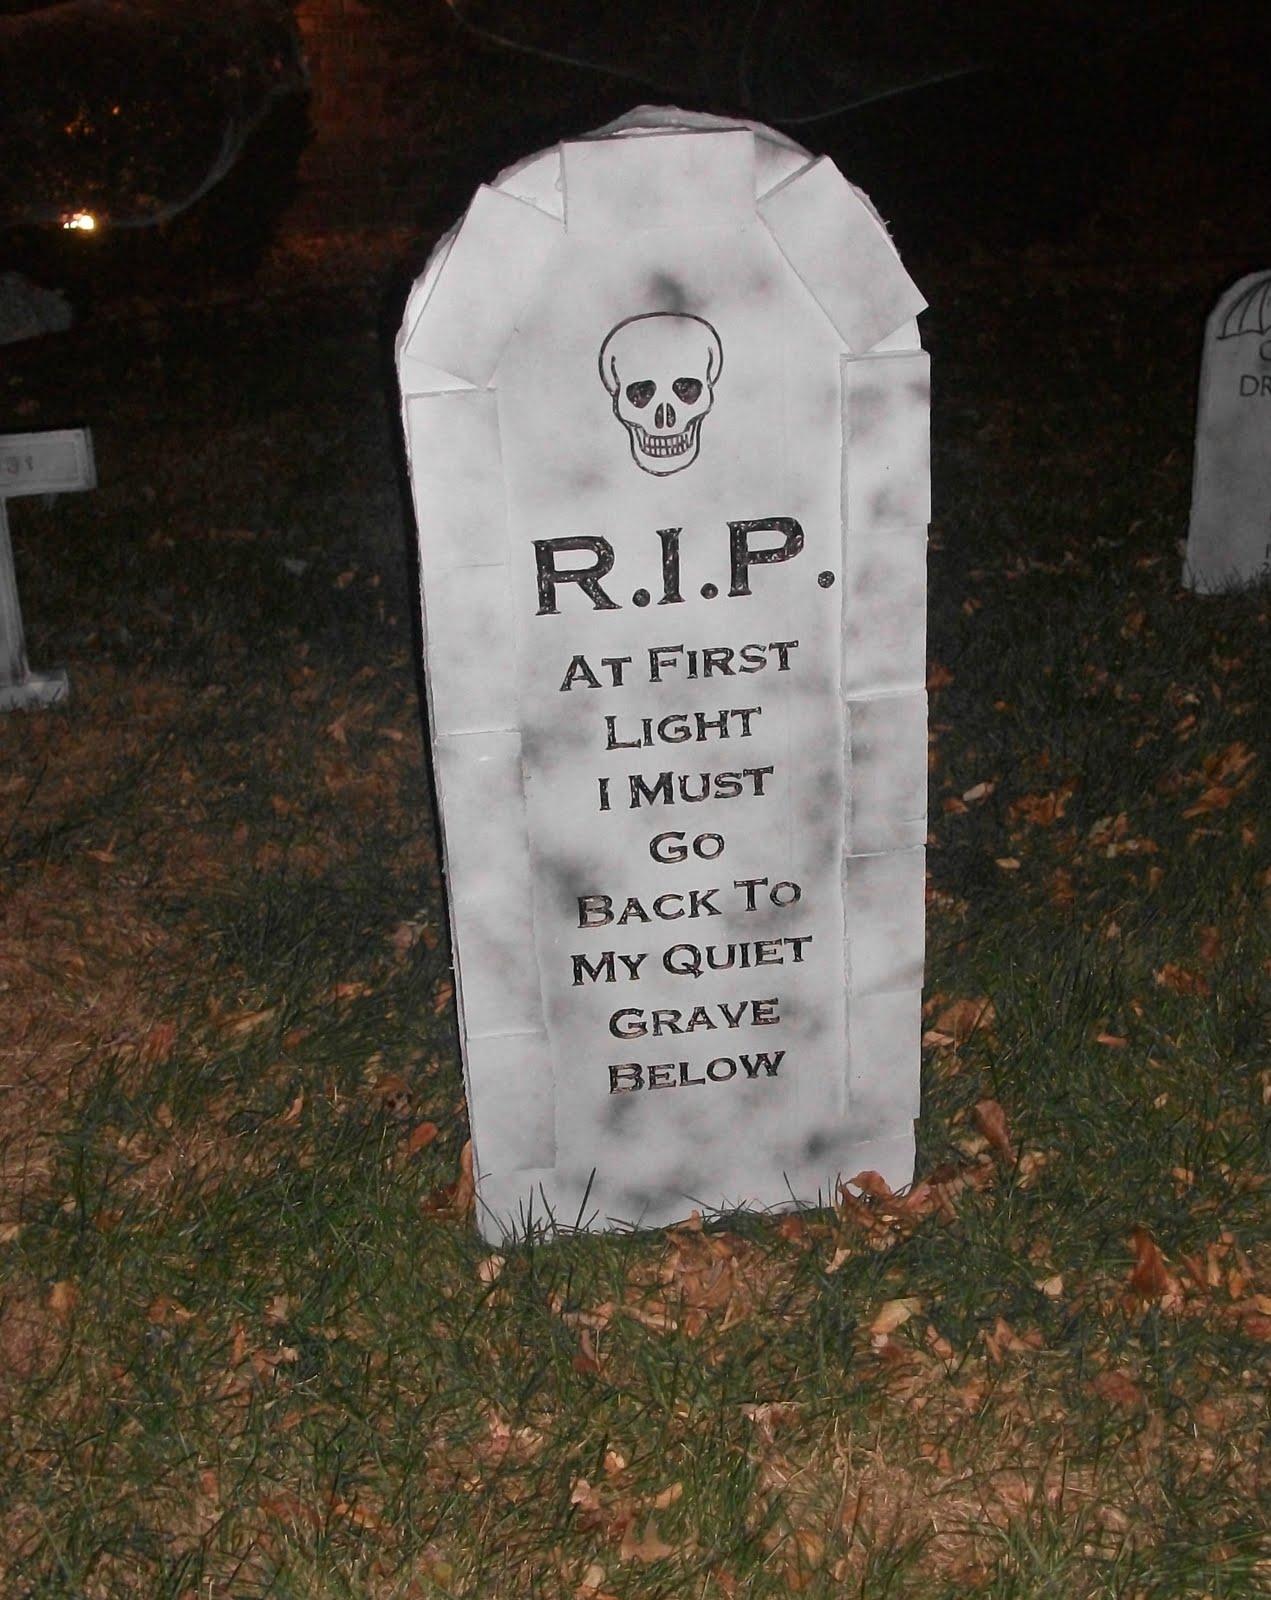 Drawn tombstone halloween decoration Days Crafty Thrifty 31